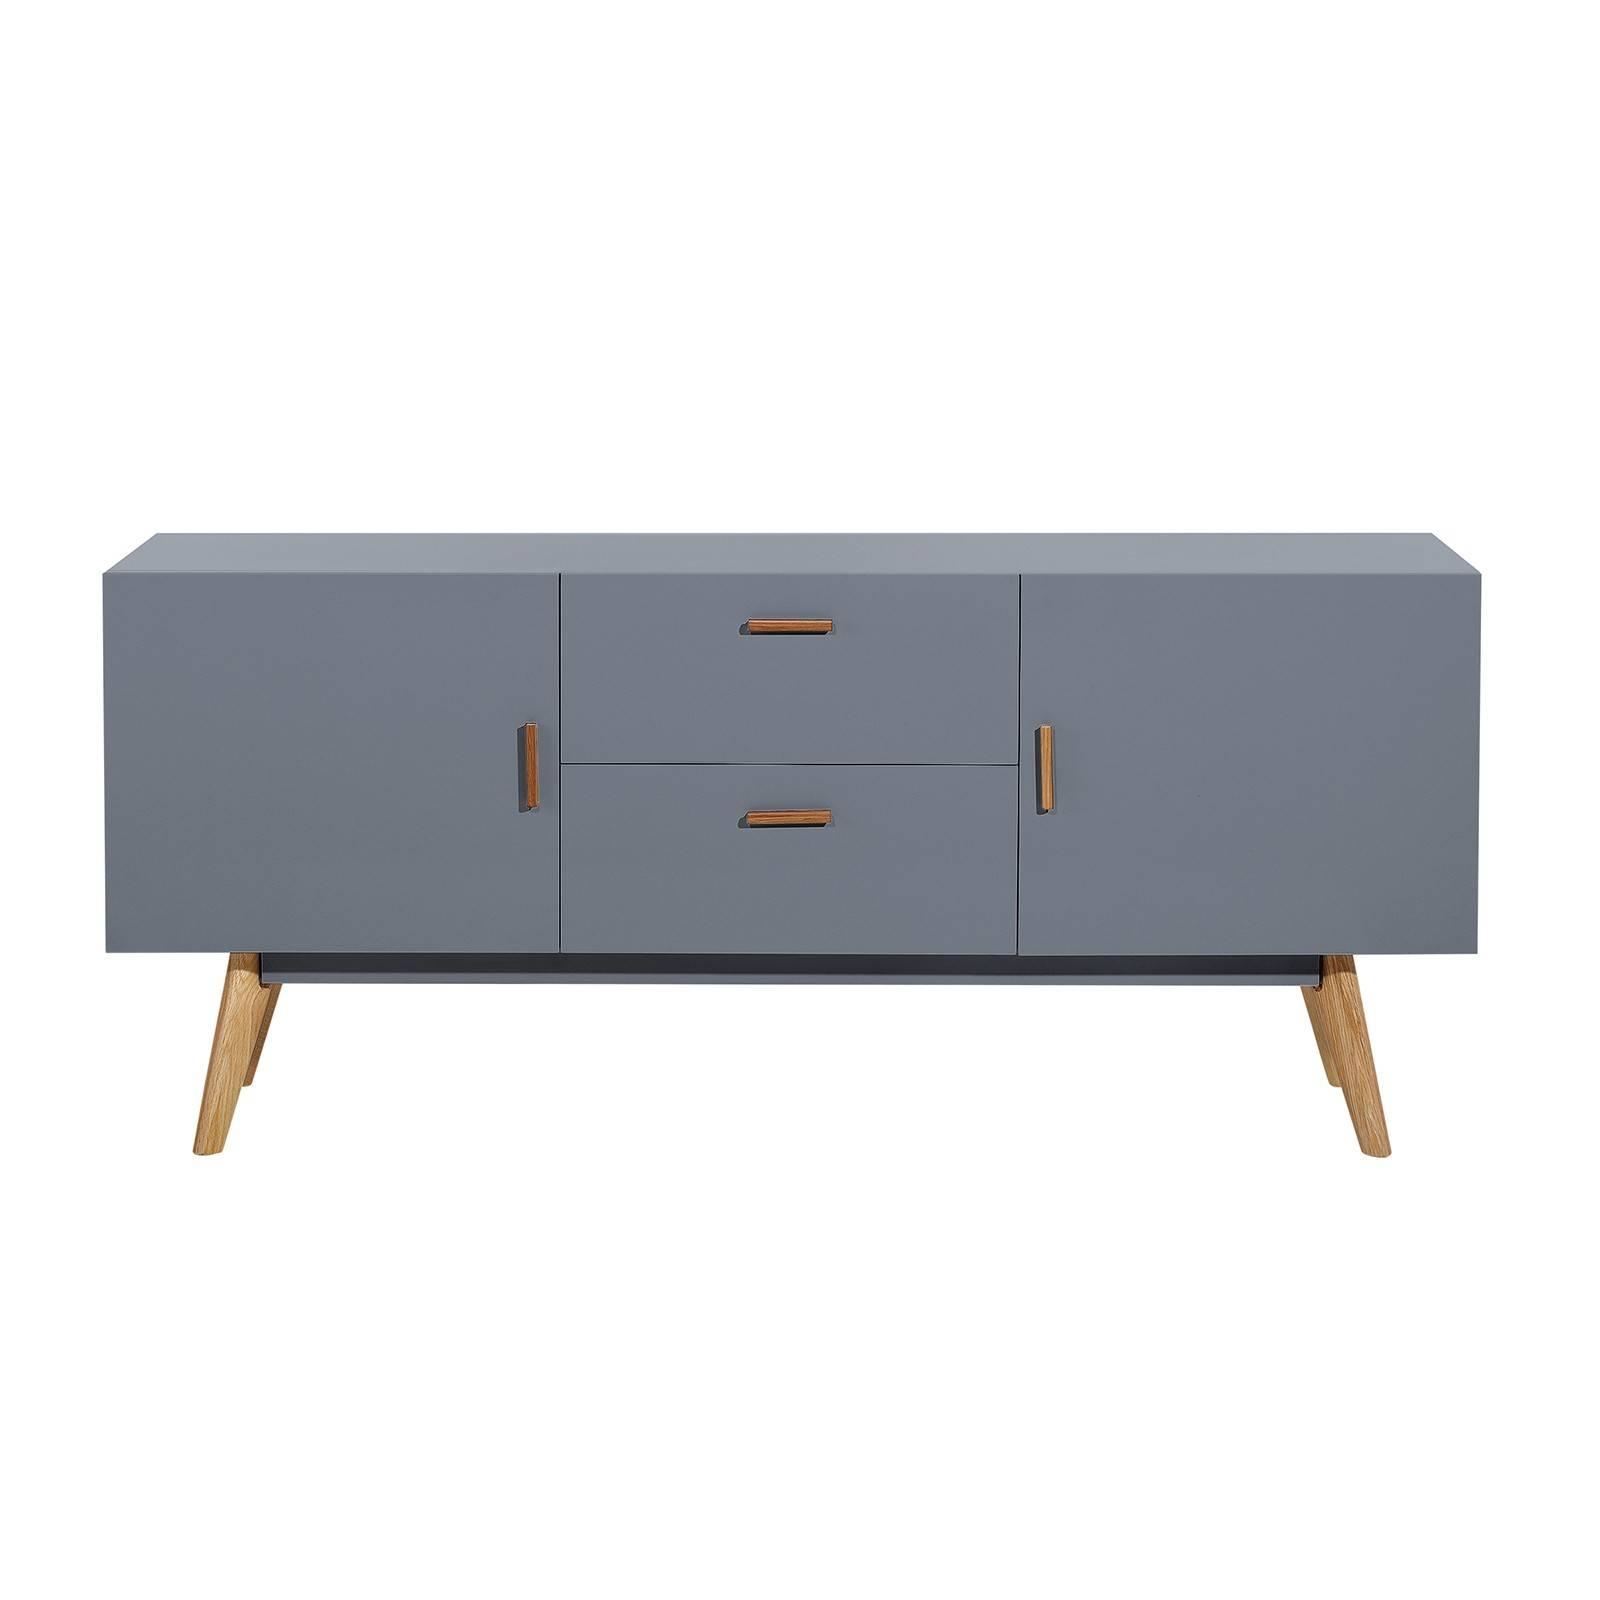 Scandinavian Retro Style White Sideboard Abreo Home Furniture Regarding Scandinavian Sideboards (View 9 of 15)